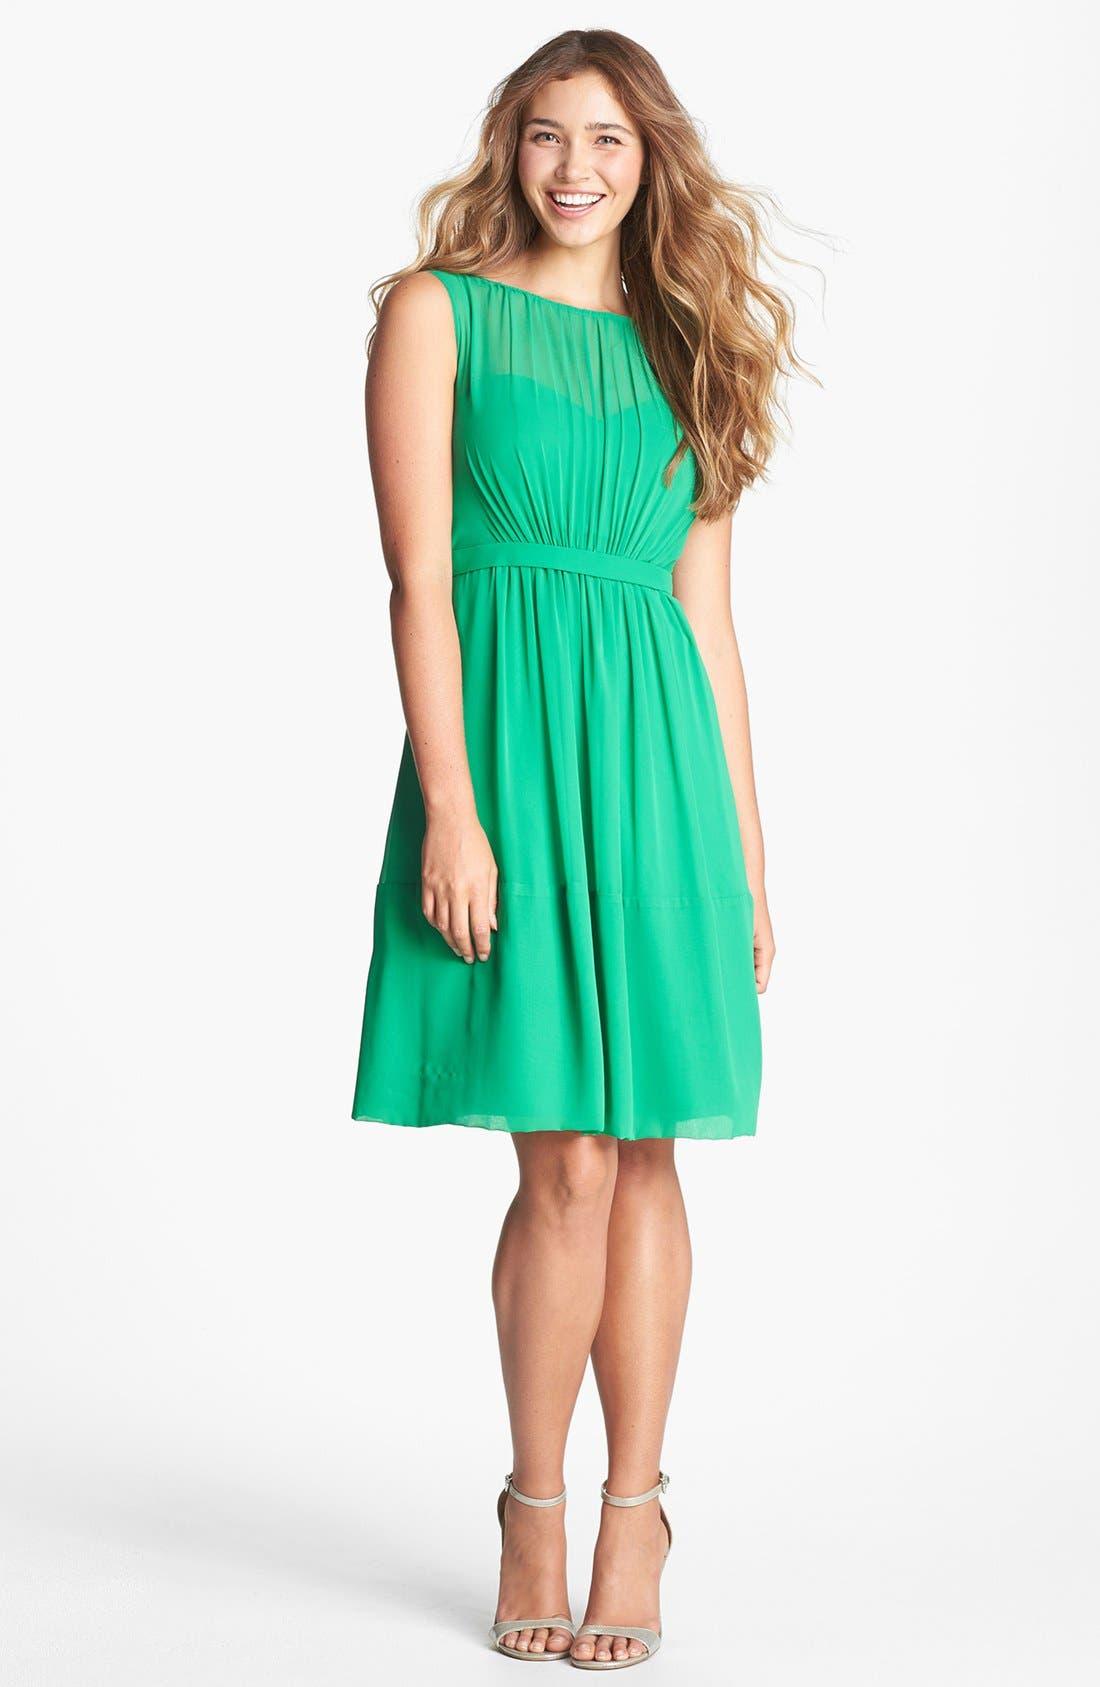 Alternate Image 1 Selected - Jenny Yoo 'Charlie' Pleat Chiffon A-Line Dress